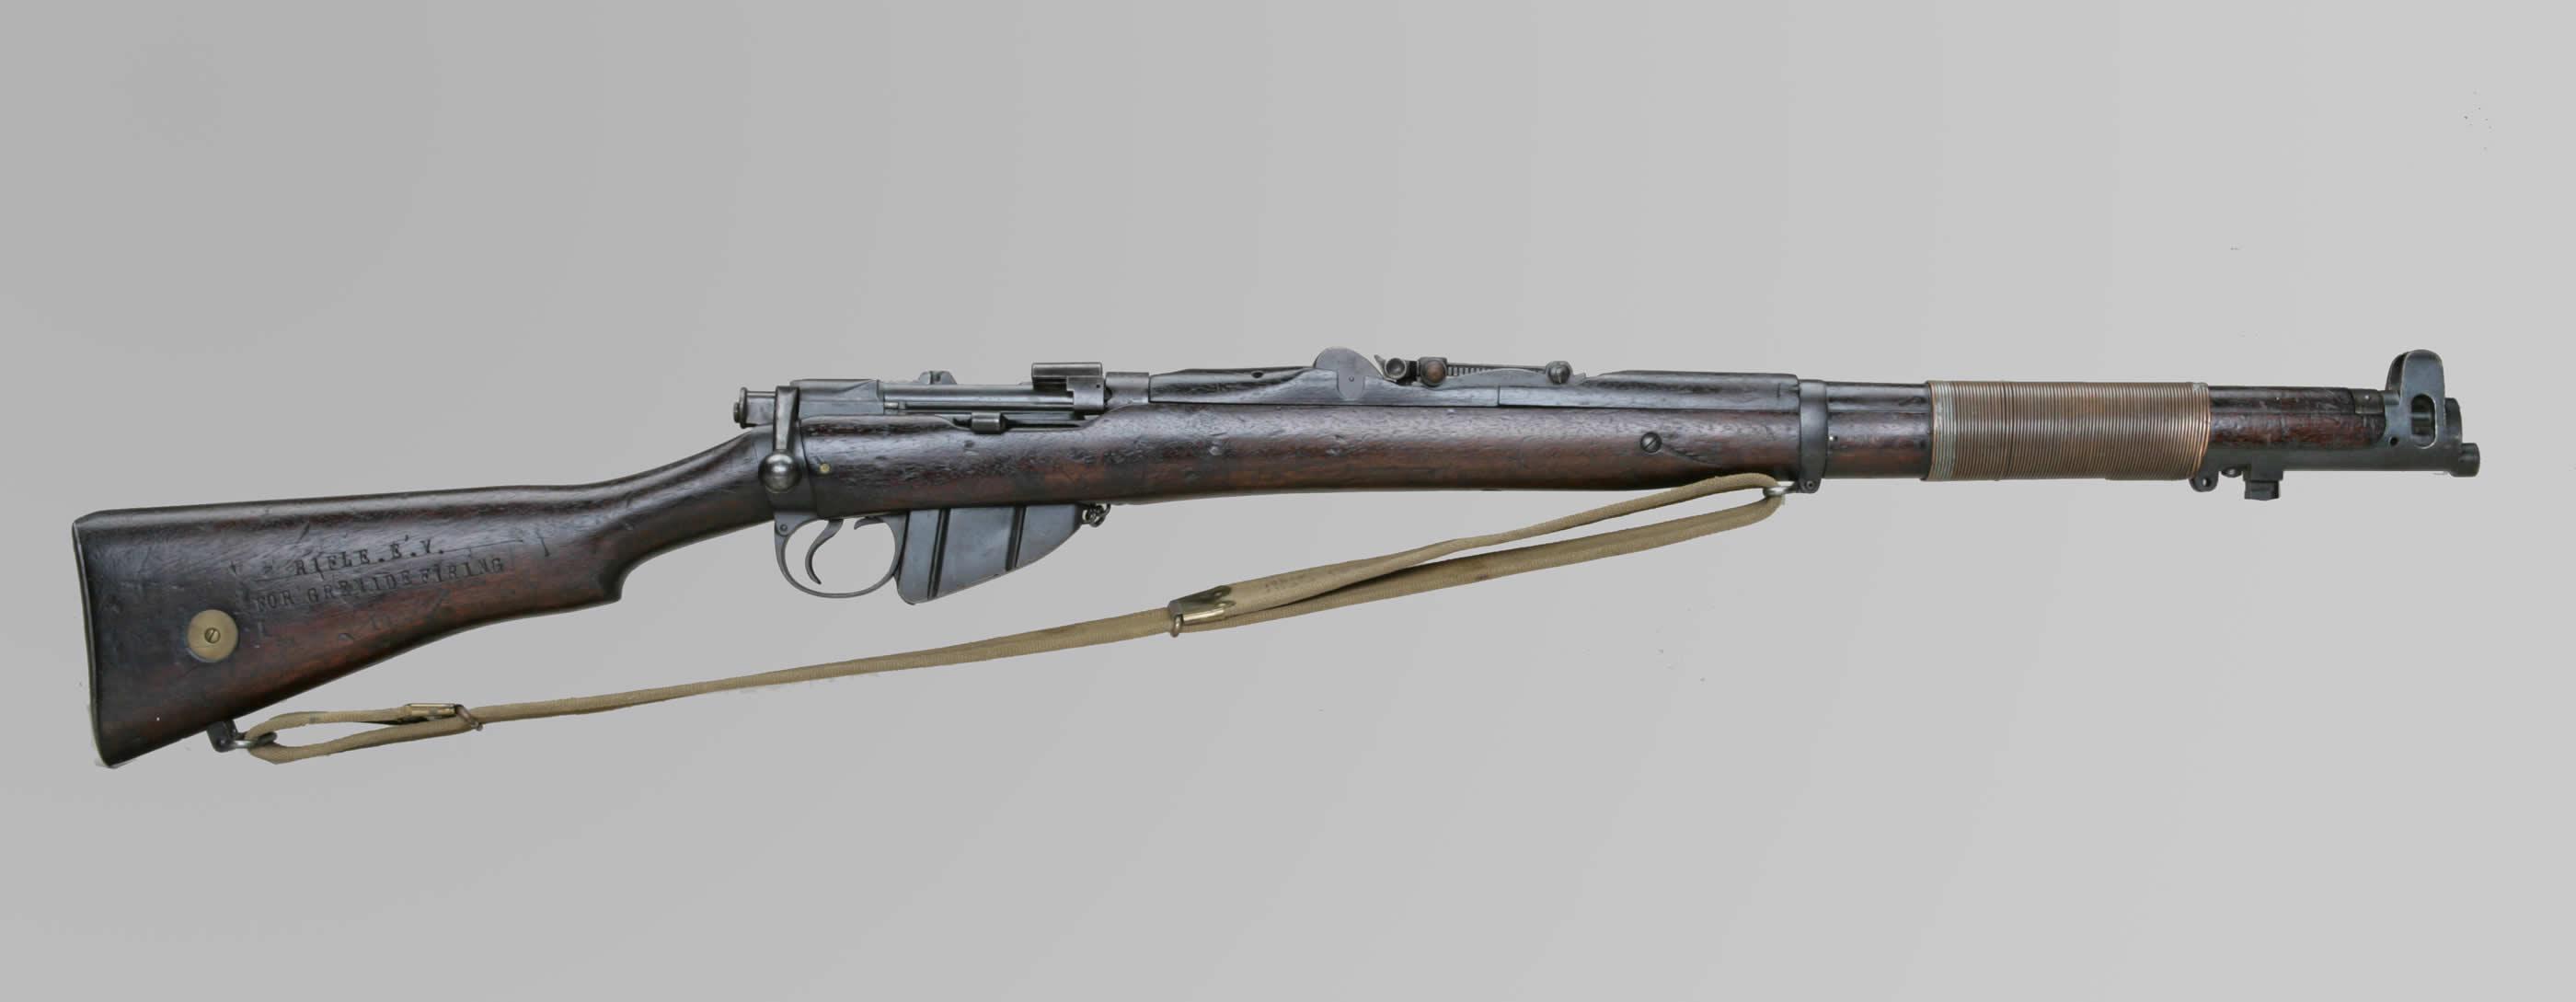 Wire Bound Lee-Enfield Rifle